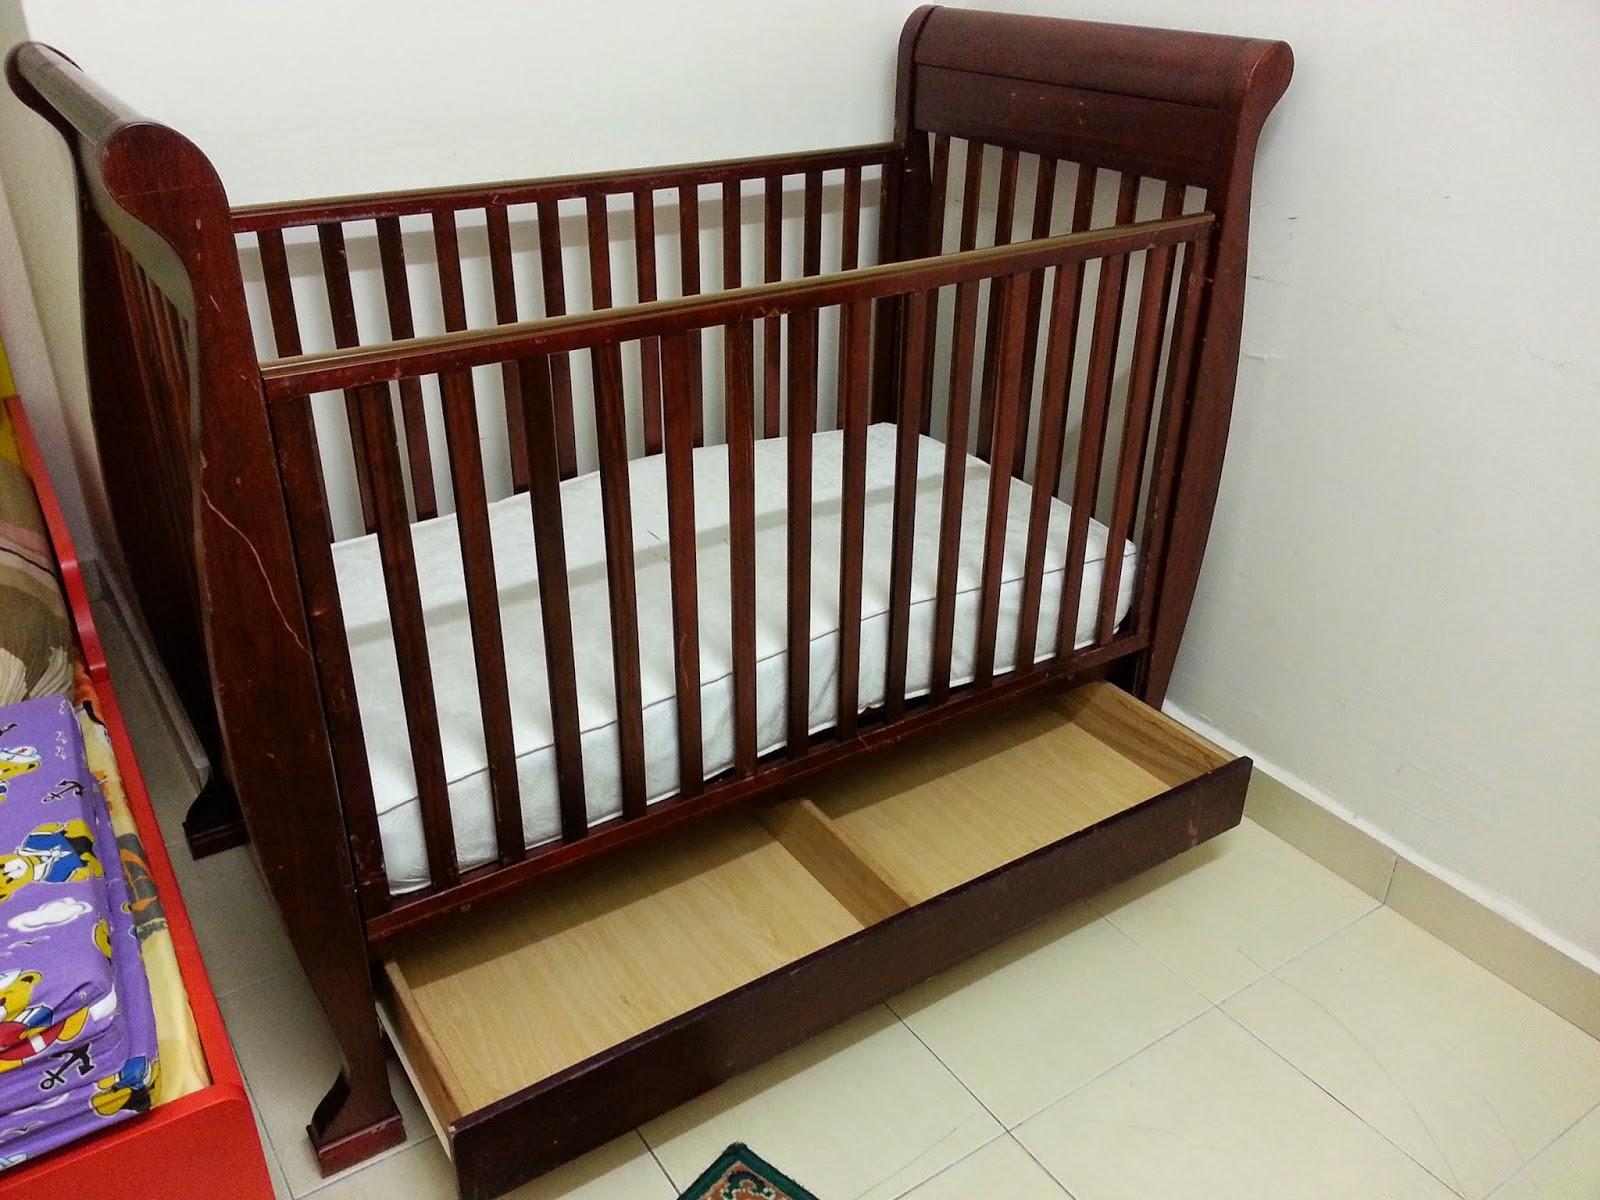 RM 850 00 nego Available RM 650 00